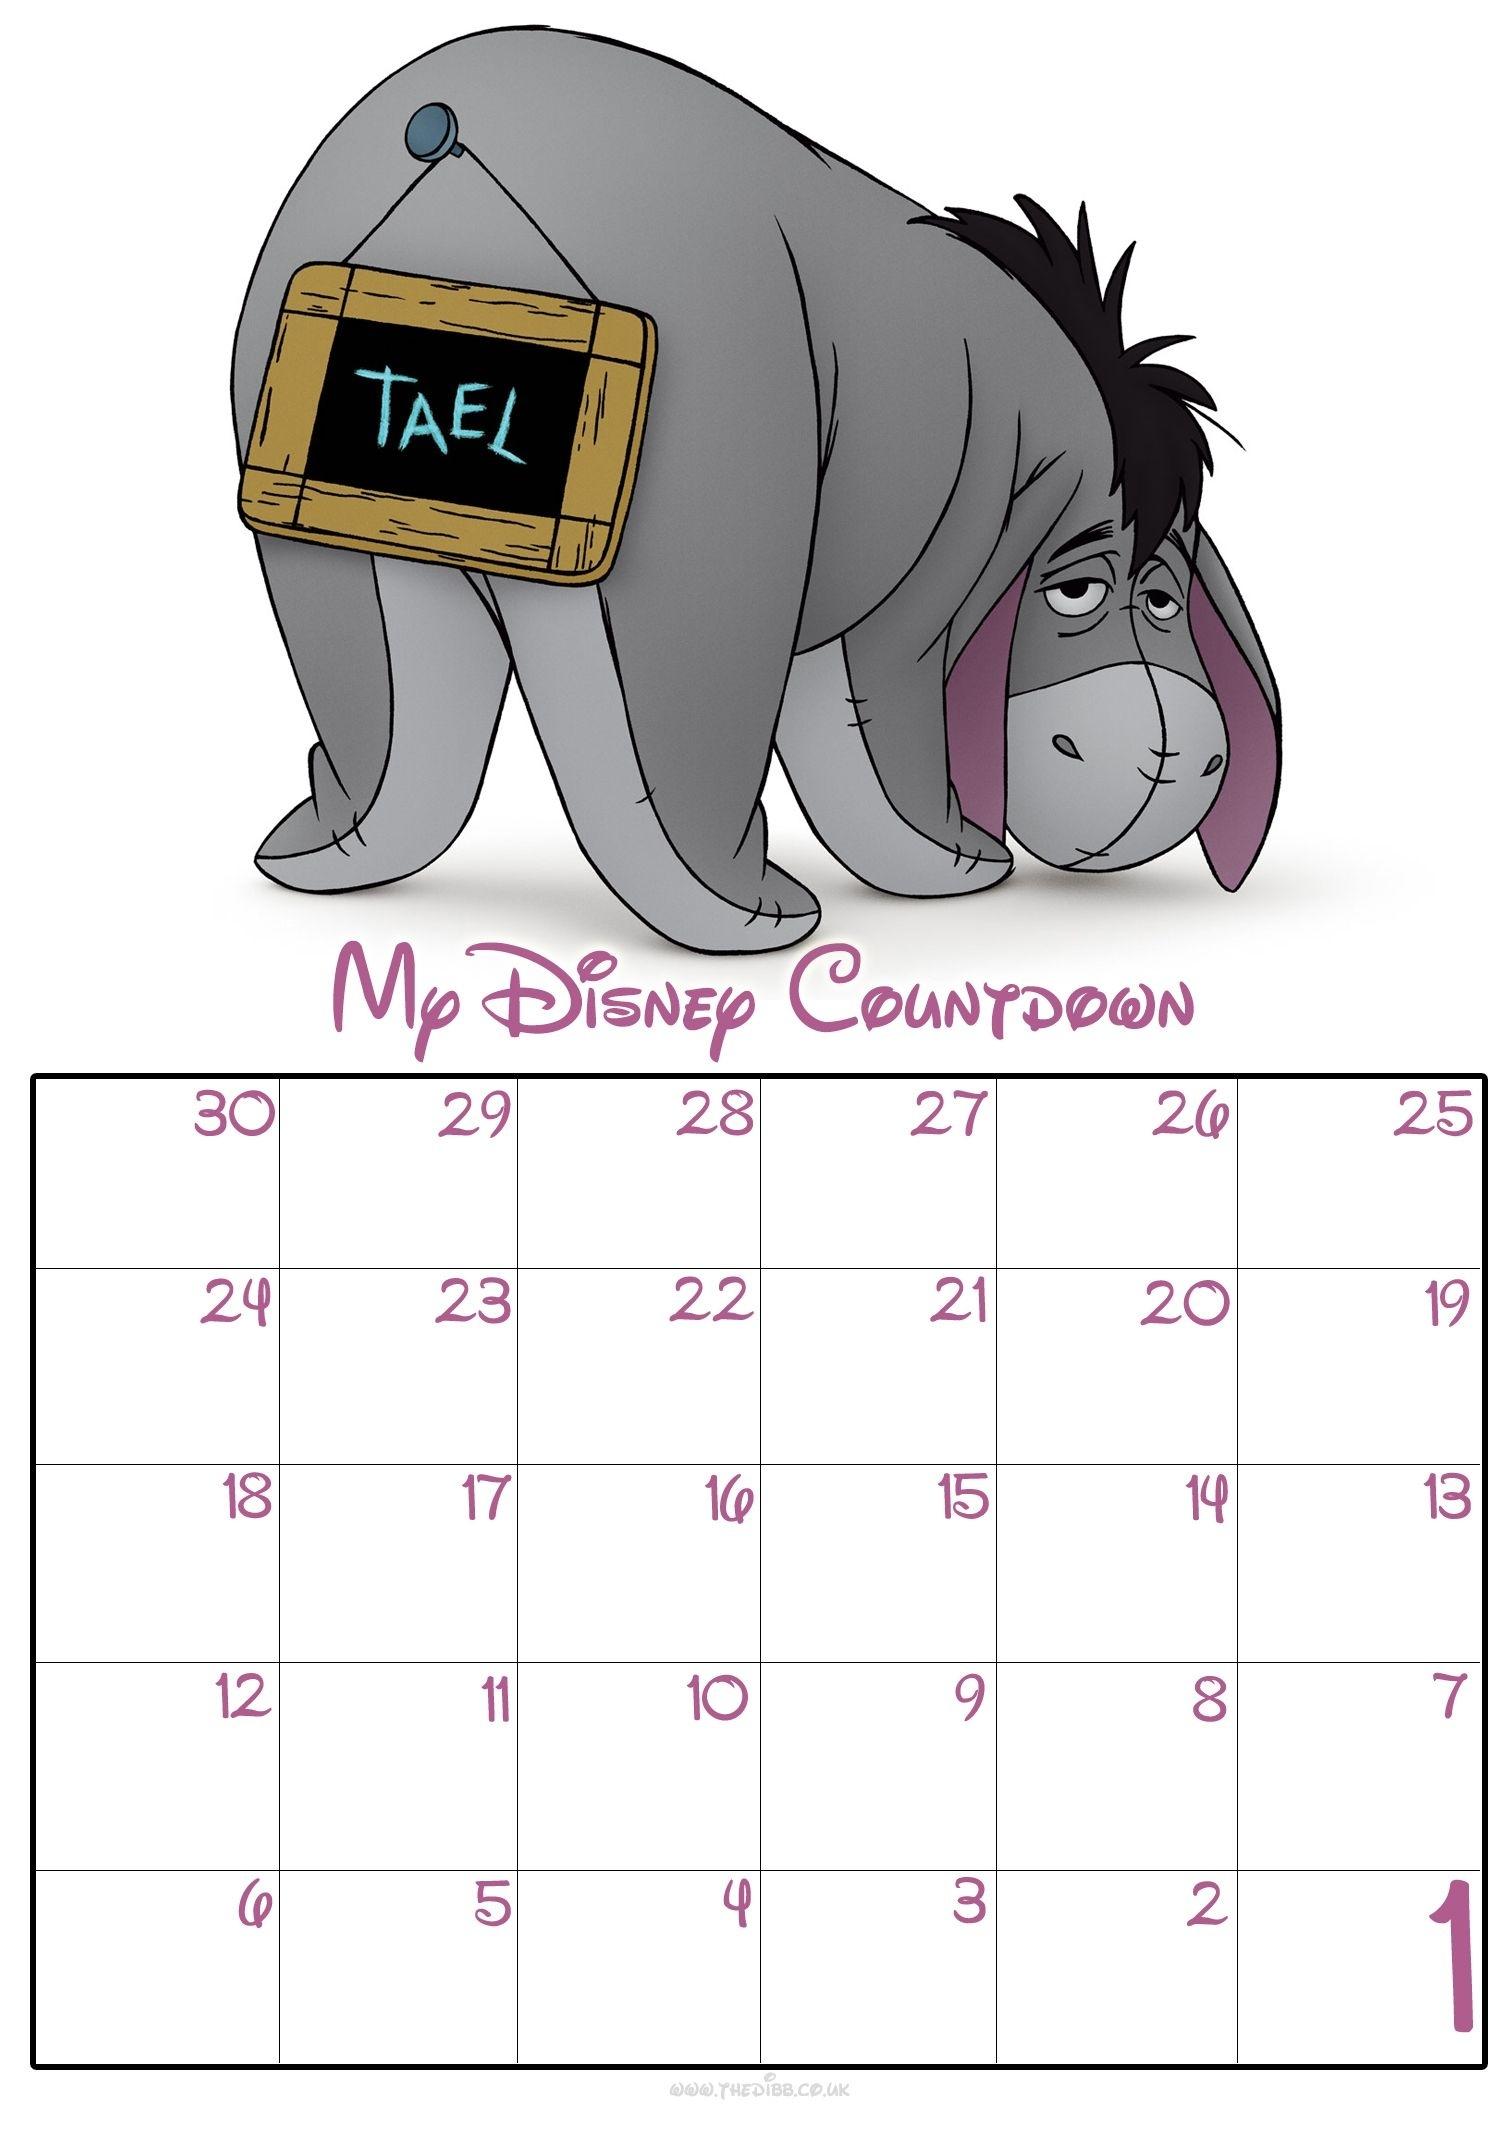 30 Day Disney Countdown Calendars | Ideas For Home Disney Countdown Calendar App